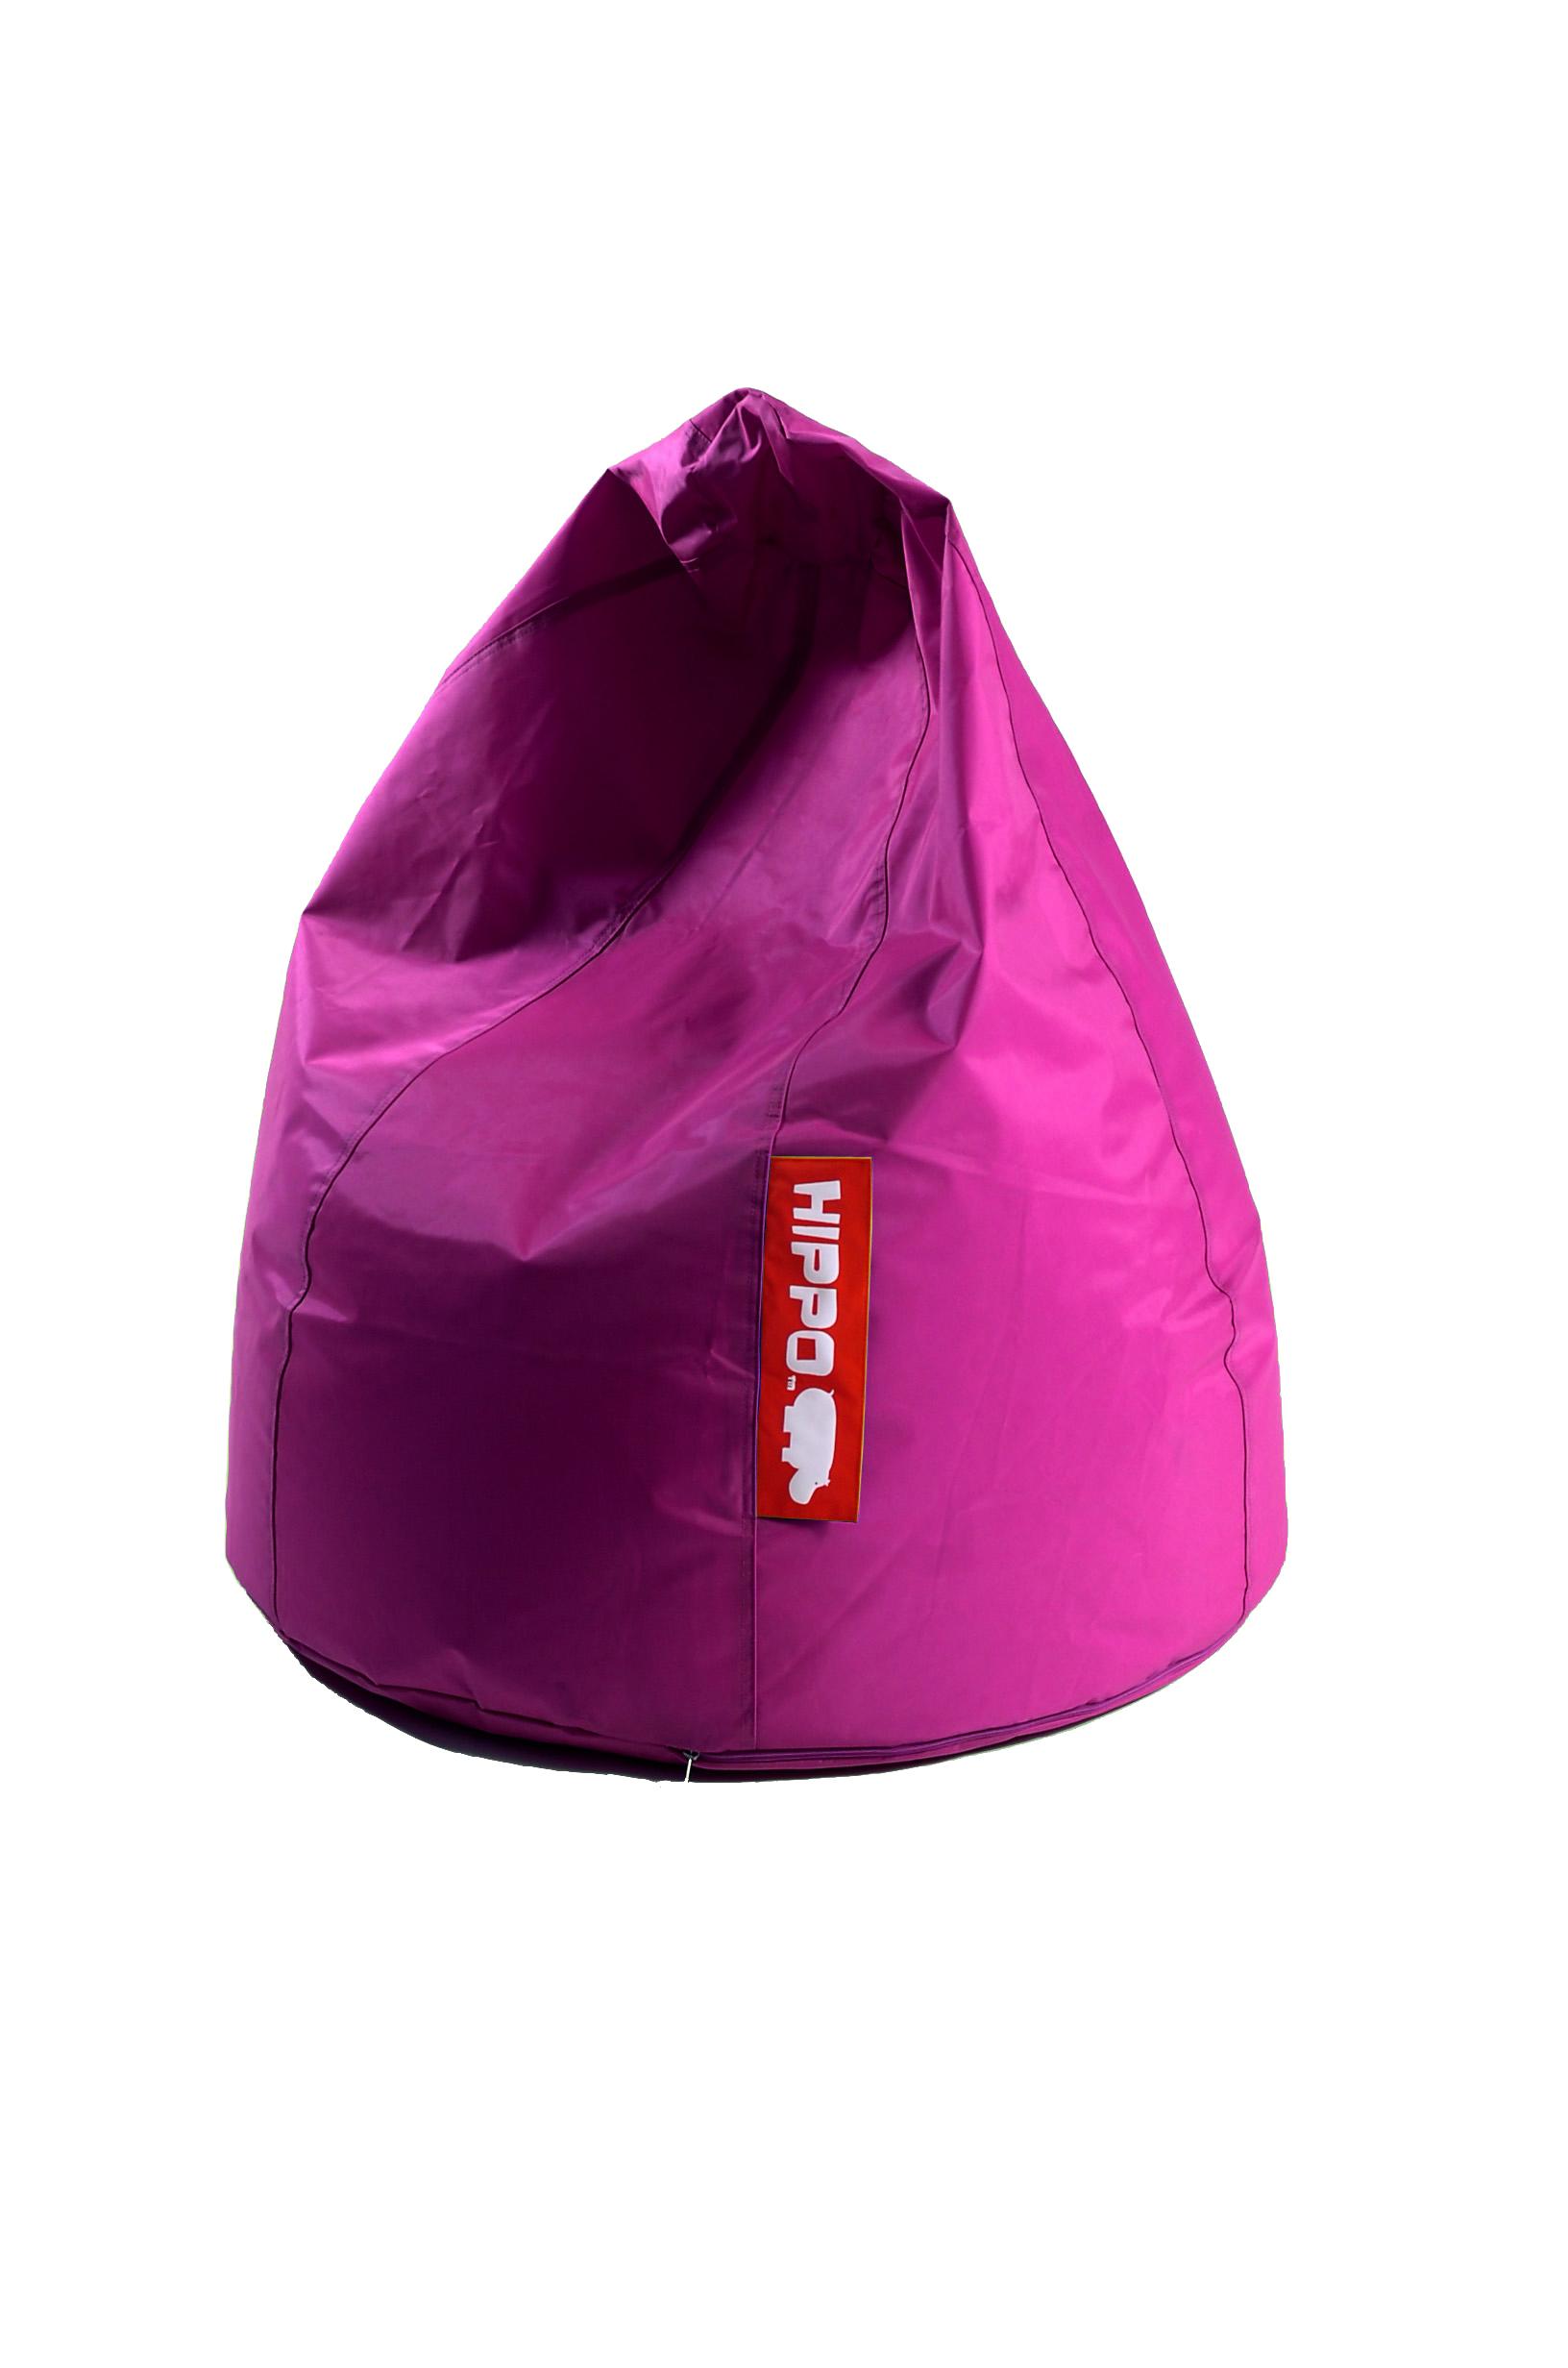 Hippo Pod Bean Bag Water Resistant Beanbag Gamer Adult